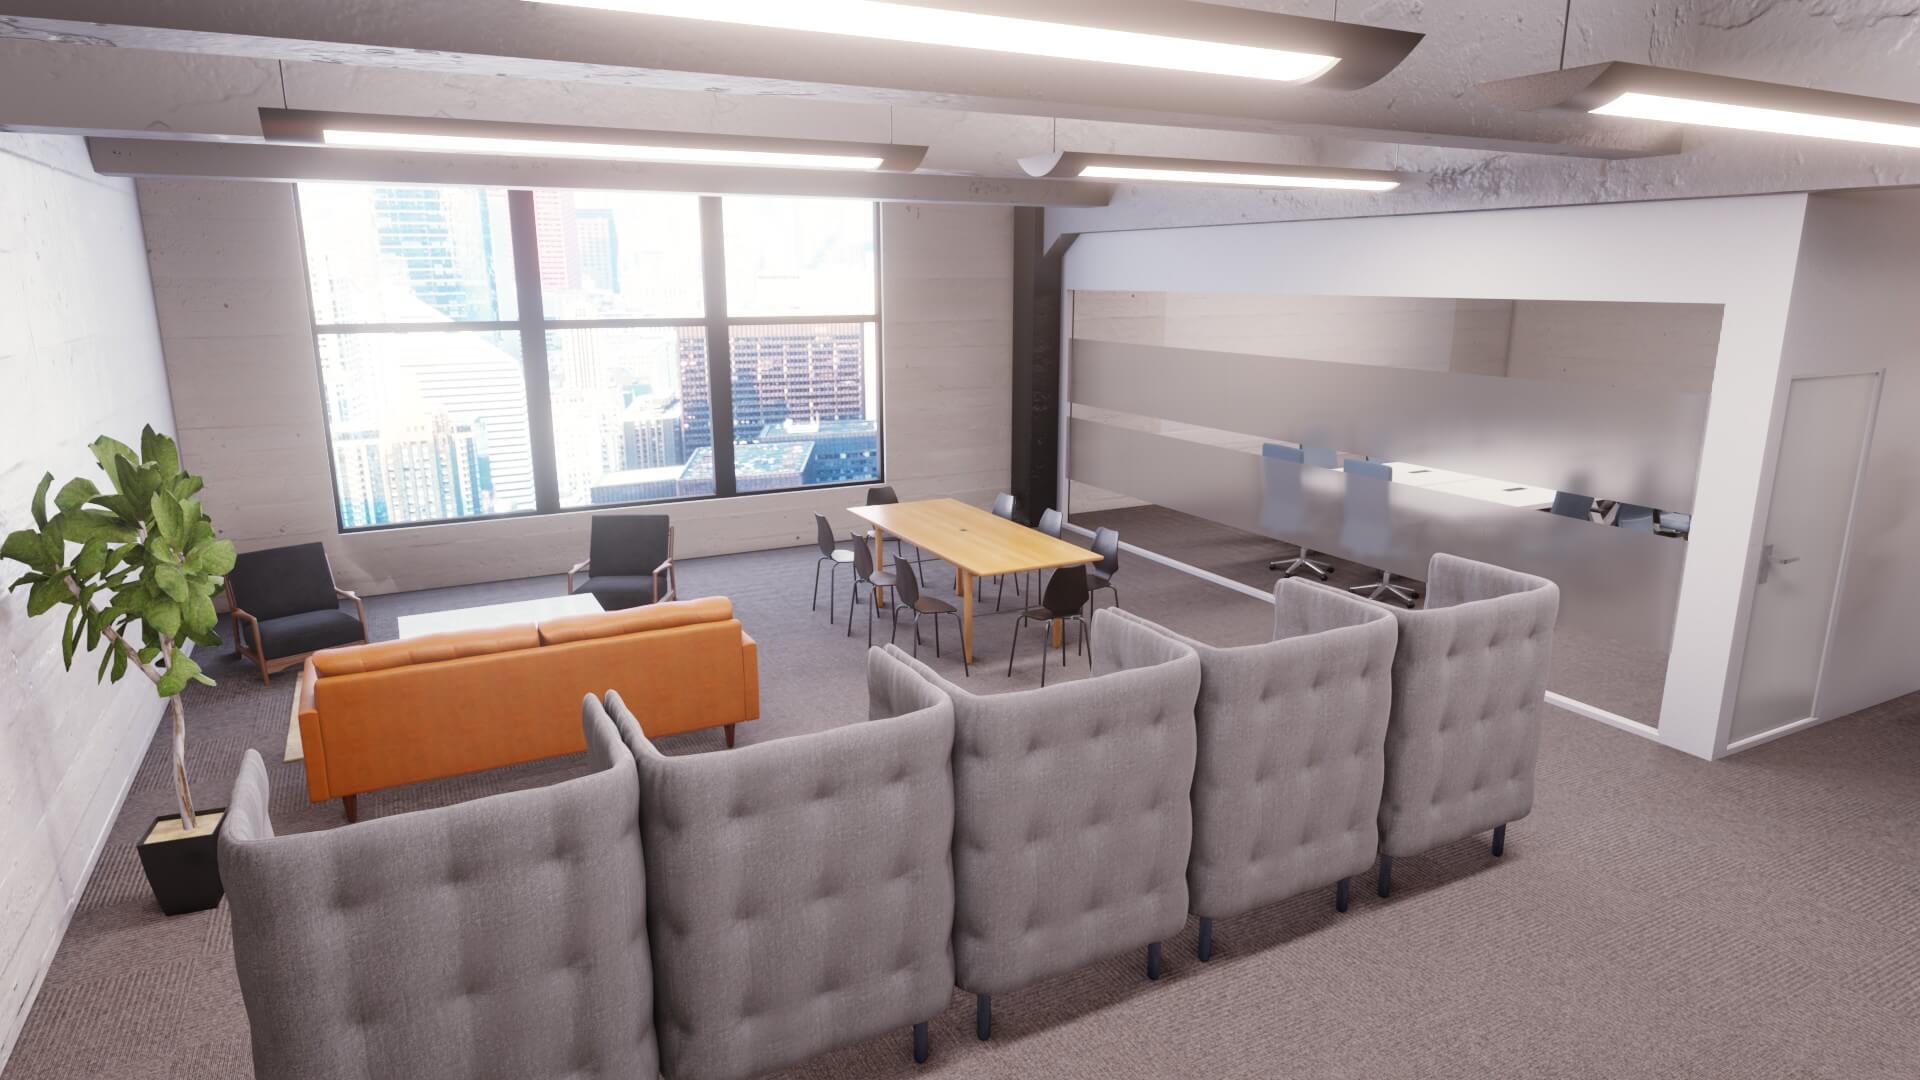 3D Office image